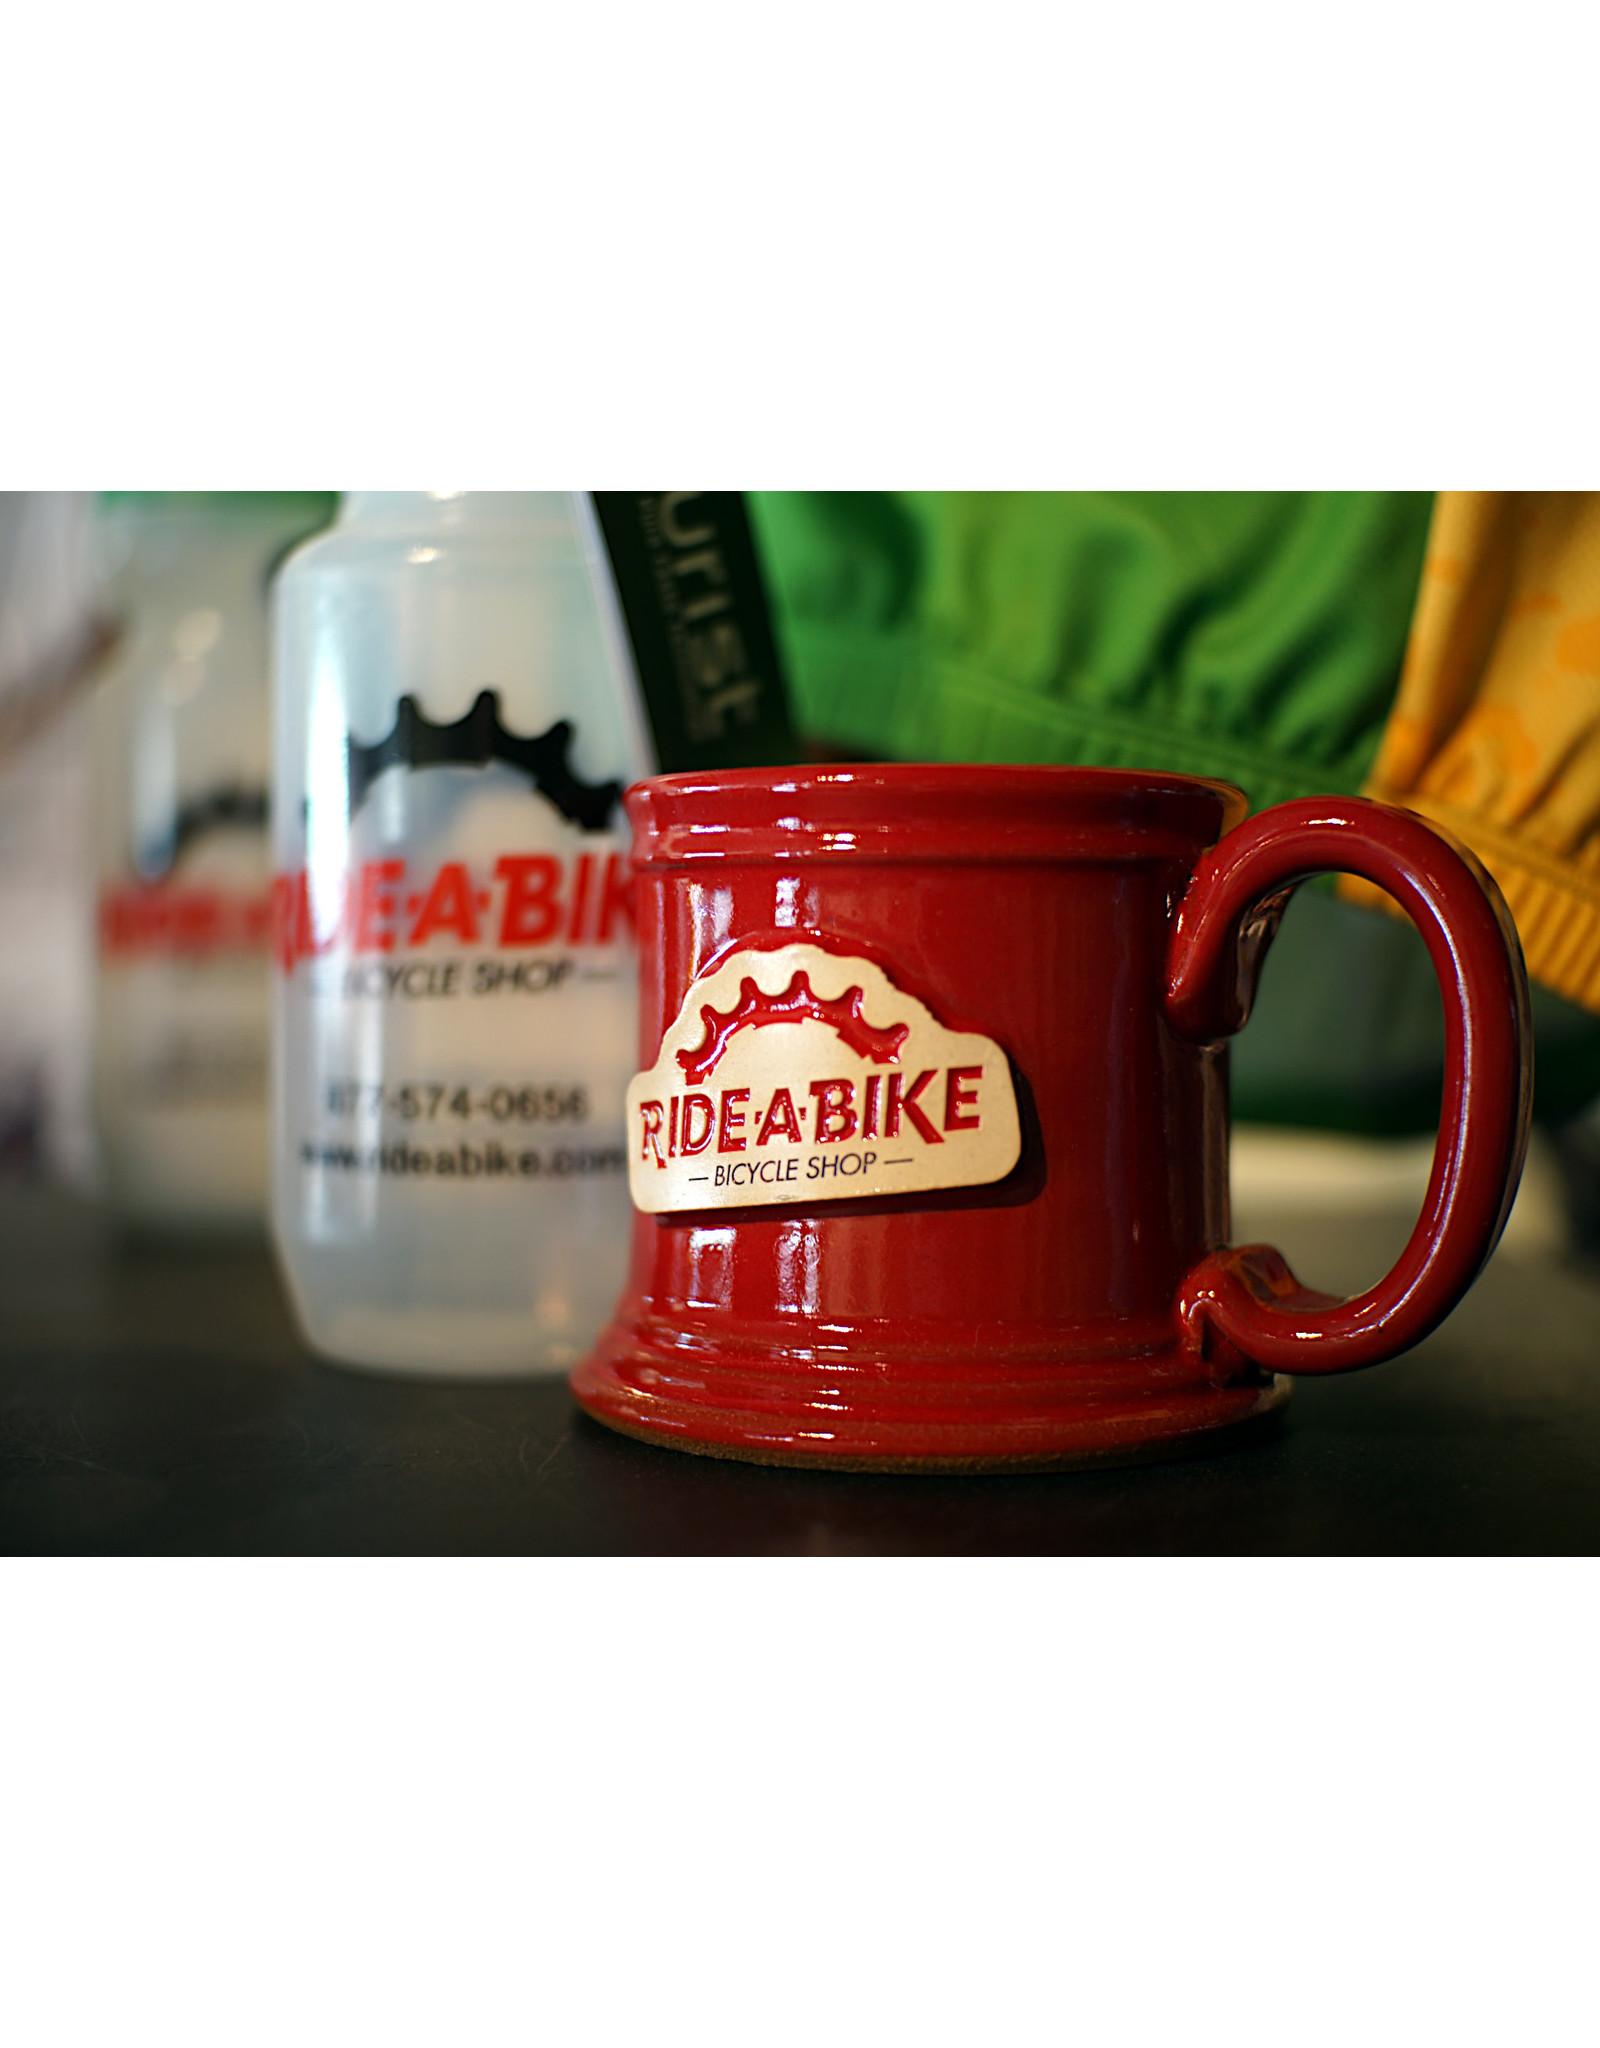 2020 Ride-A-Bike Coffee Mug; 12oz; Red; Limited Edition!